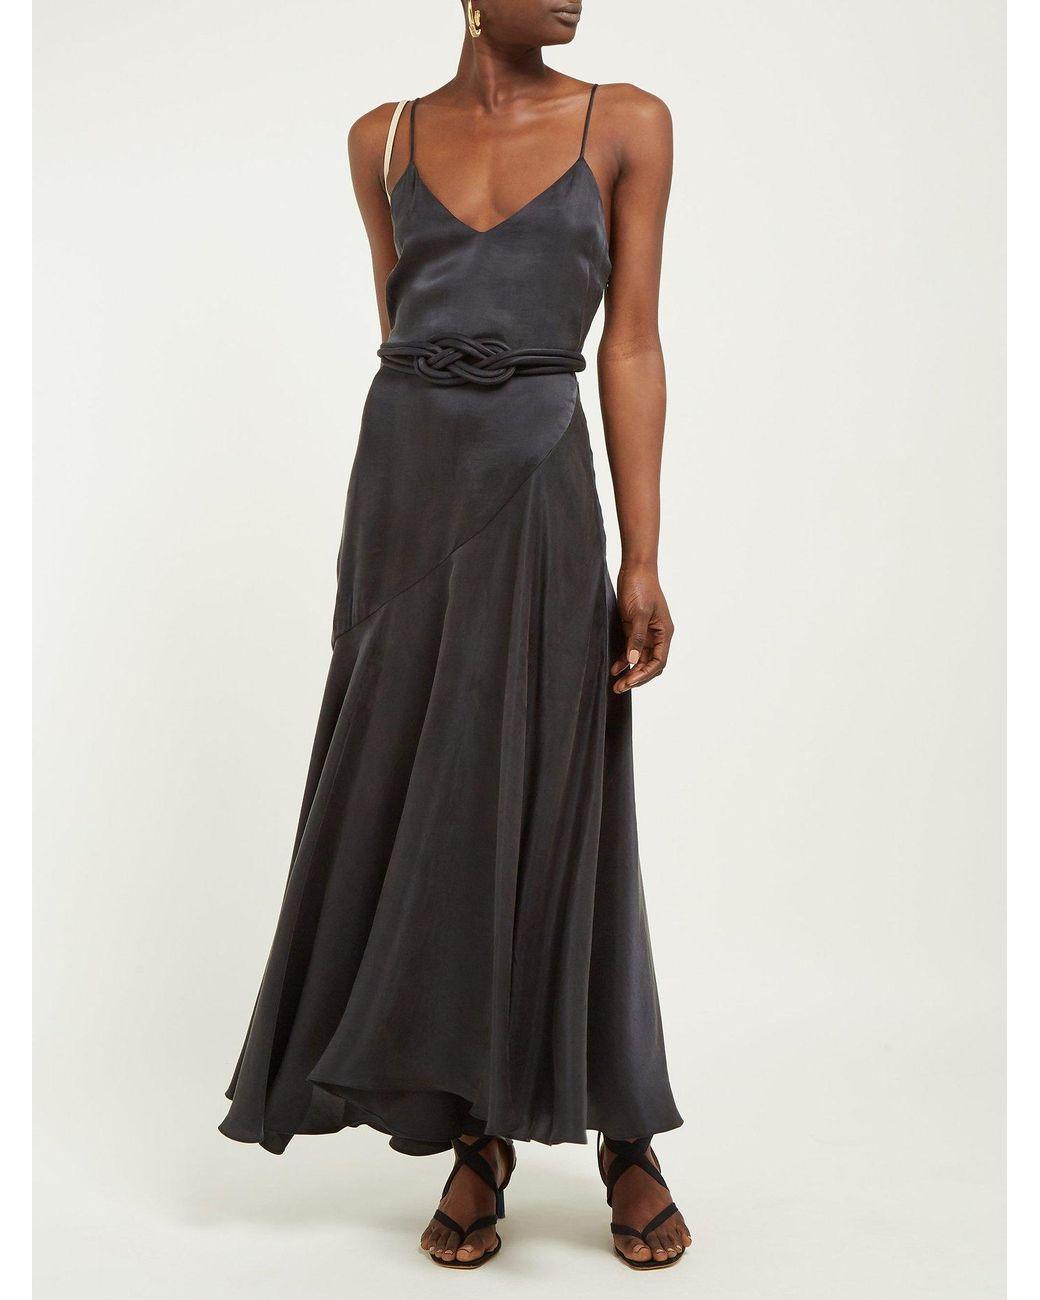 a166abf1b1dd Mara Hoffman Nina Bias Cut Satin Dress in Black - Lyst